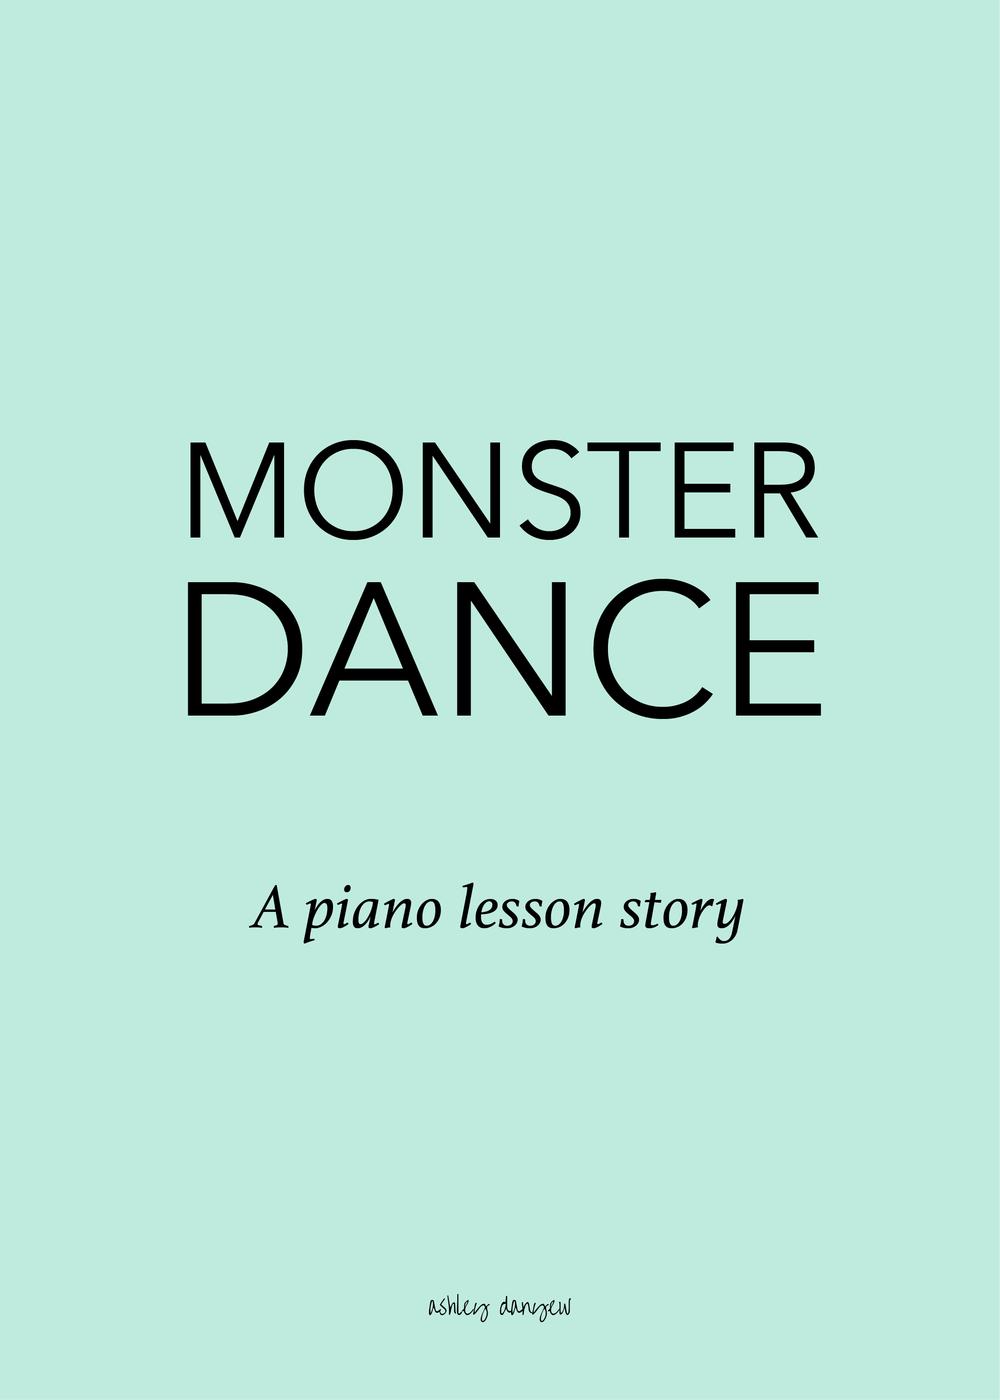 Monster Dance.png